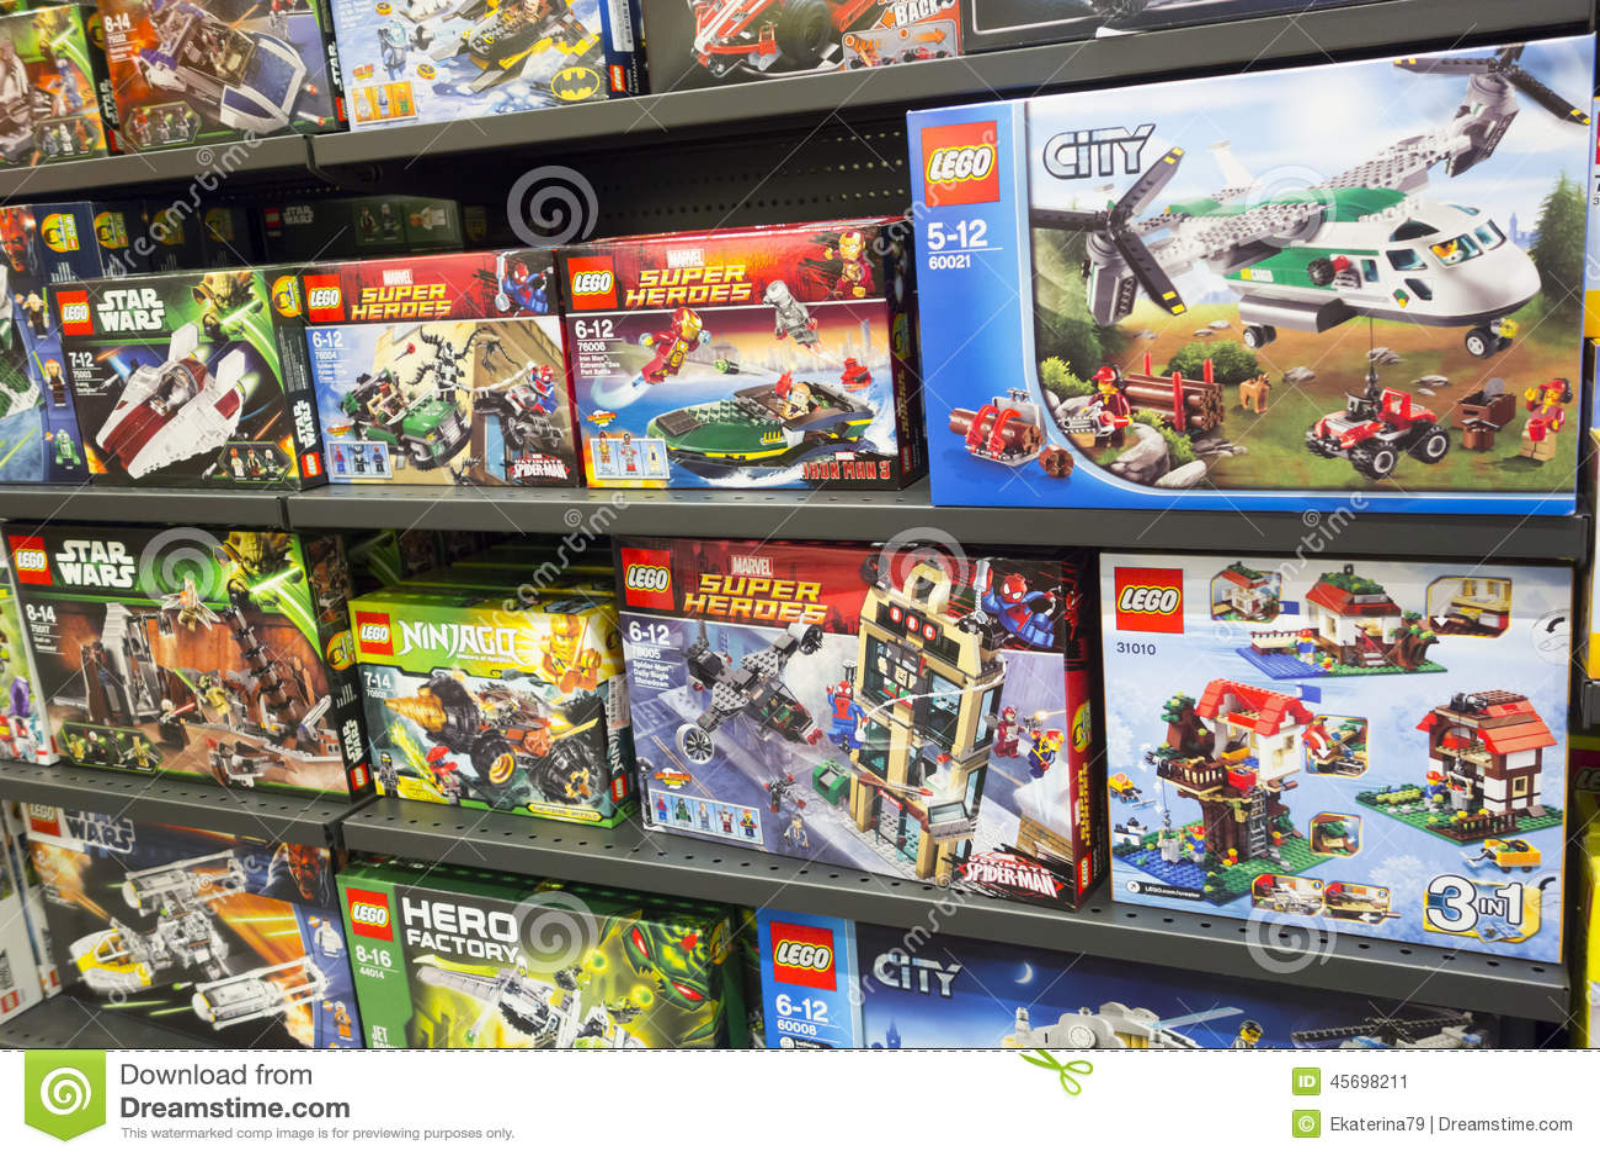 Коробки Lego на полках